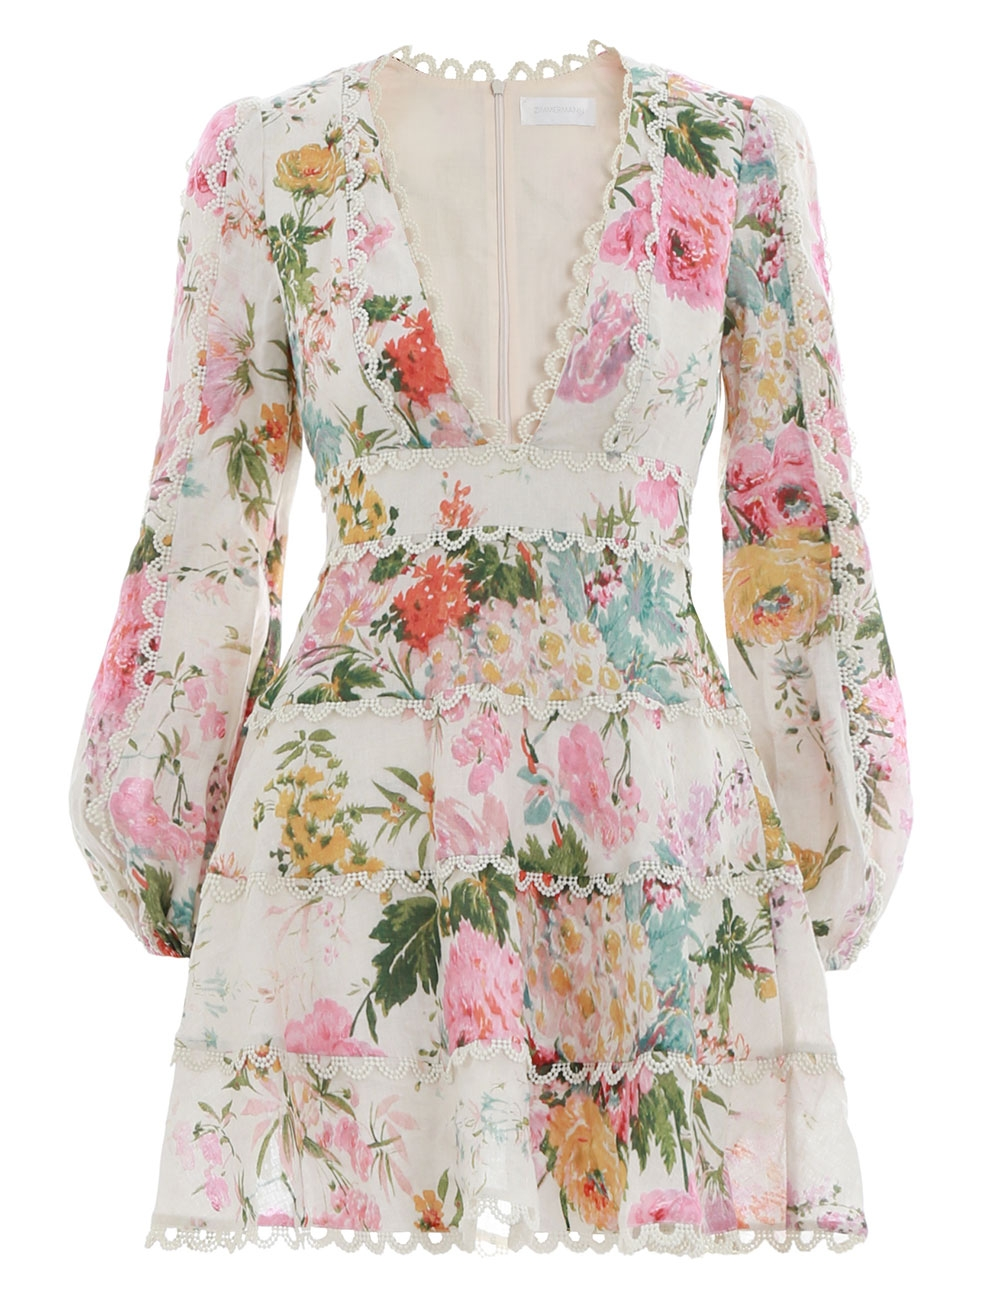 f6c5684b9950 1.5302dhea.grf.garden_floral-heathers-flounce-short-dress -flat.jpg?width=500&height=645&canvas=500:645&quality=100&bg-color=255,255,255&fit=bounds